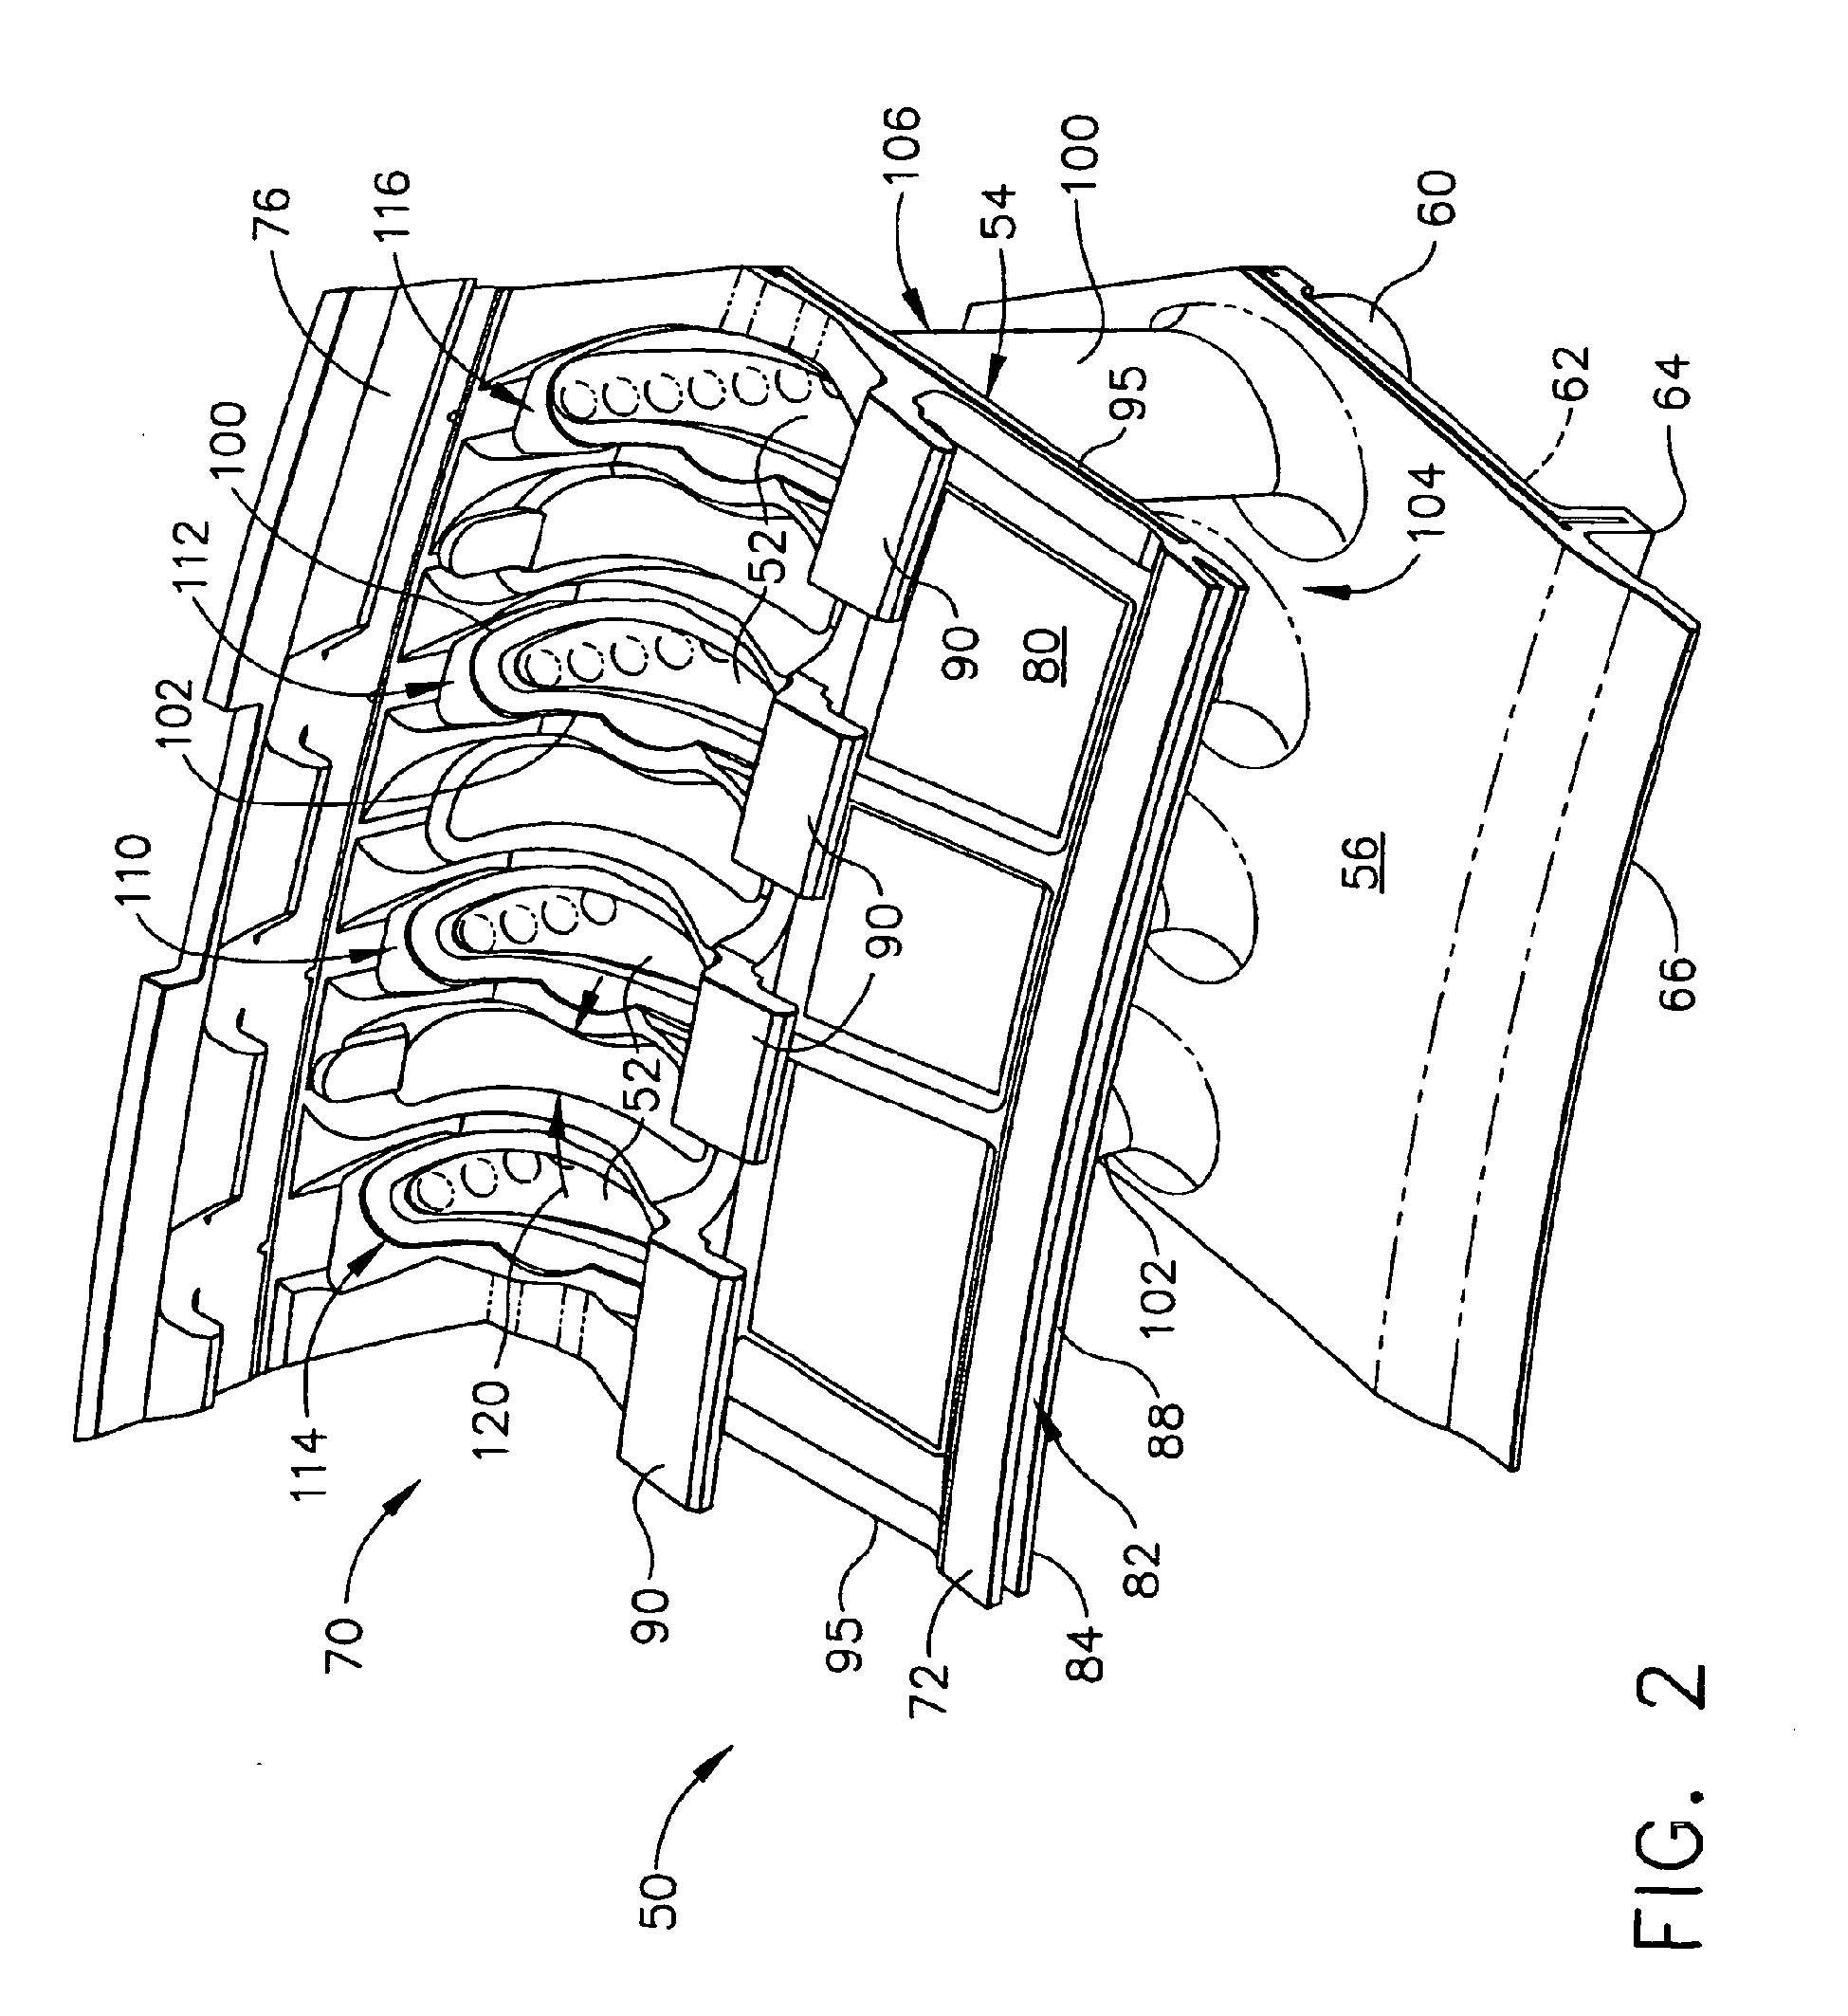 Patent EP B1 Gas turbine nozzle and gas turbine engine